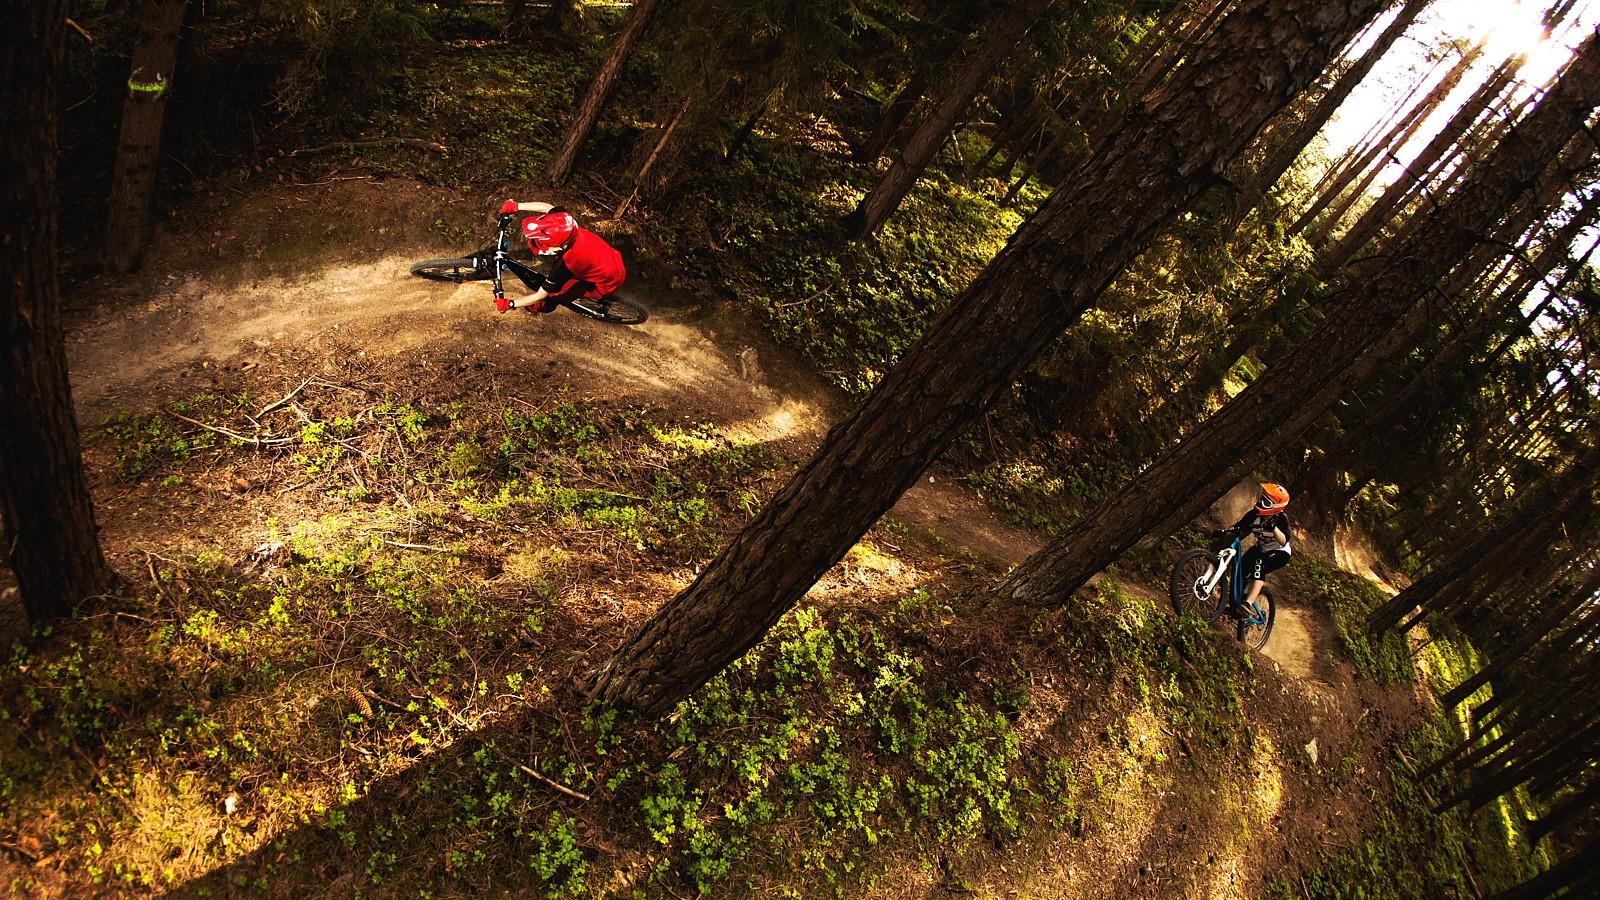 Girls way... - Mad Moss - Mountain Biking Pictures - Vital MTB